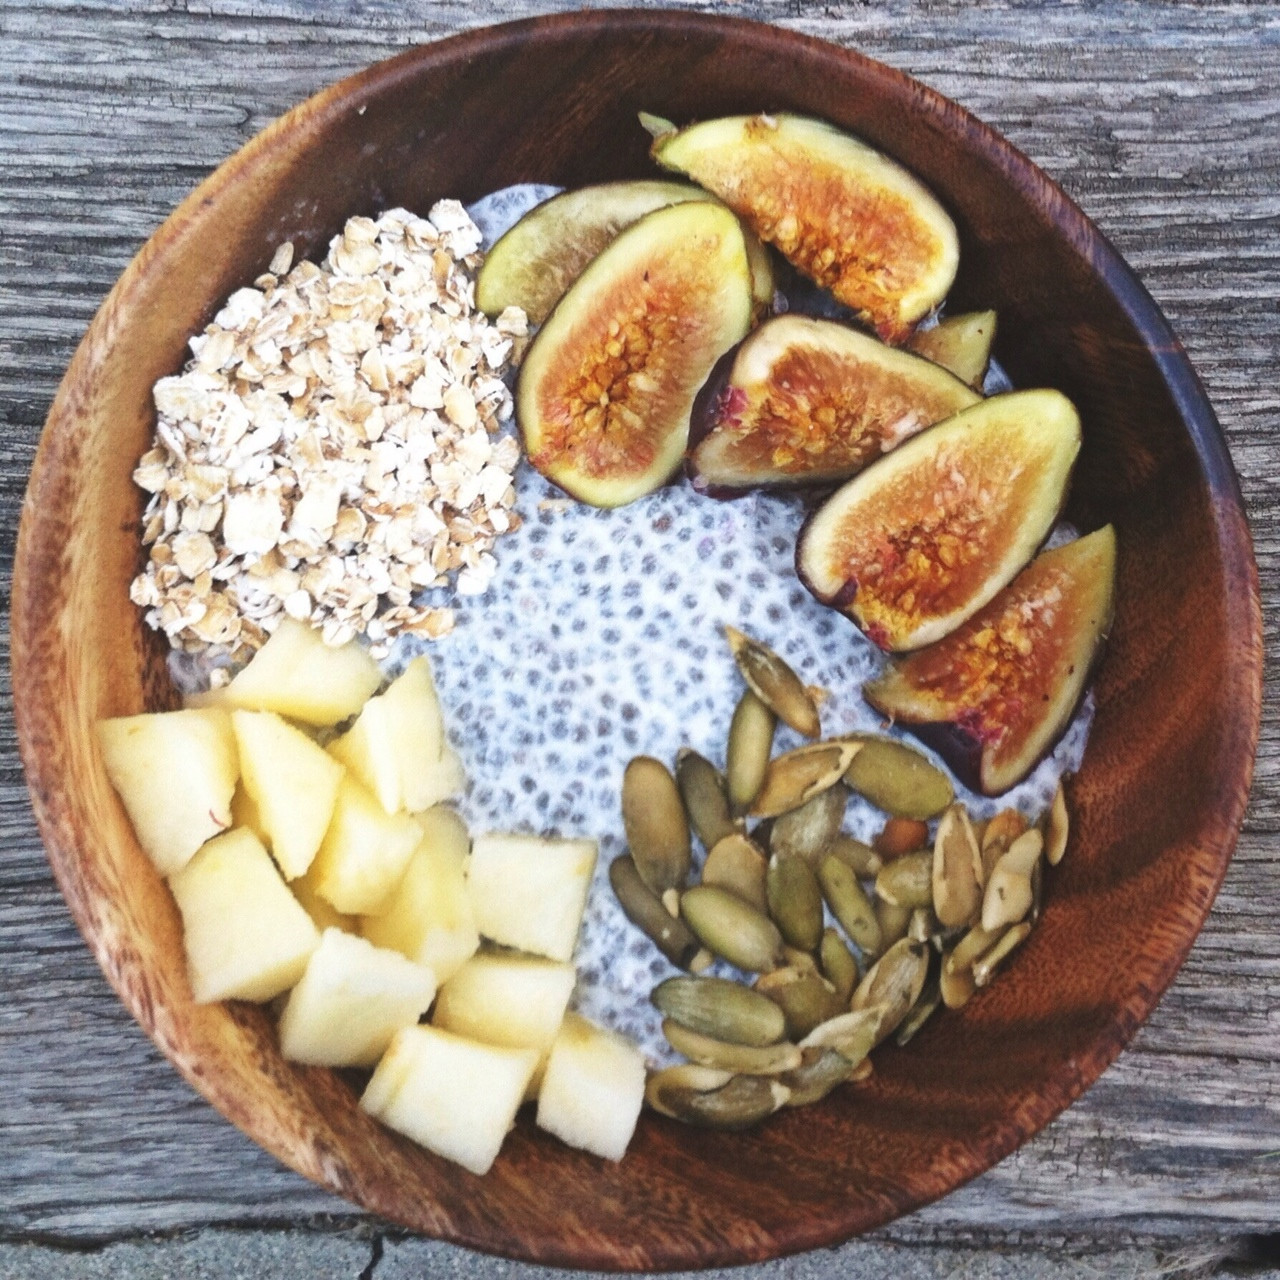 Chia Seed Breakfast Recipes  Chia Seed Breakfast Bowl Recipe — Dishmaps